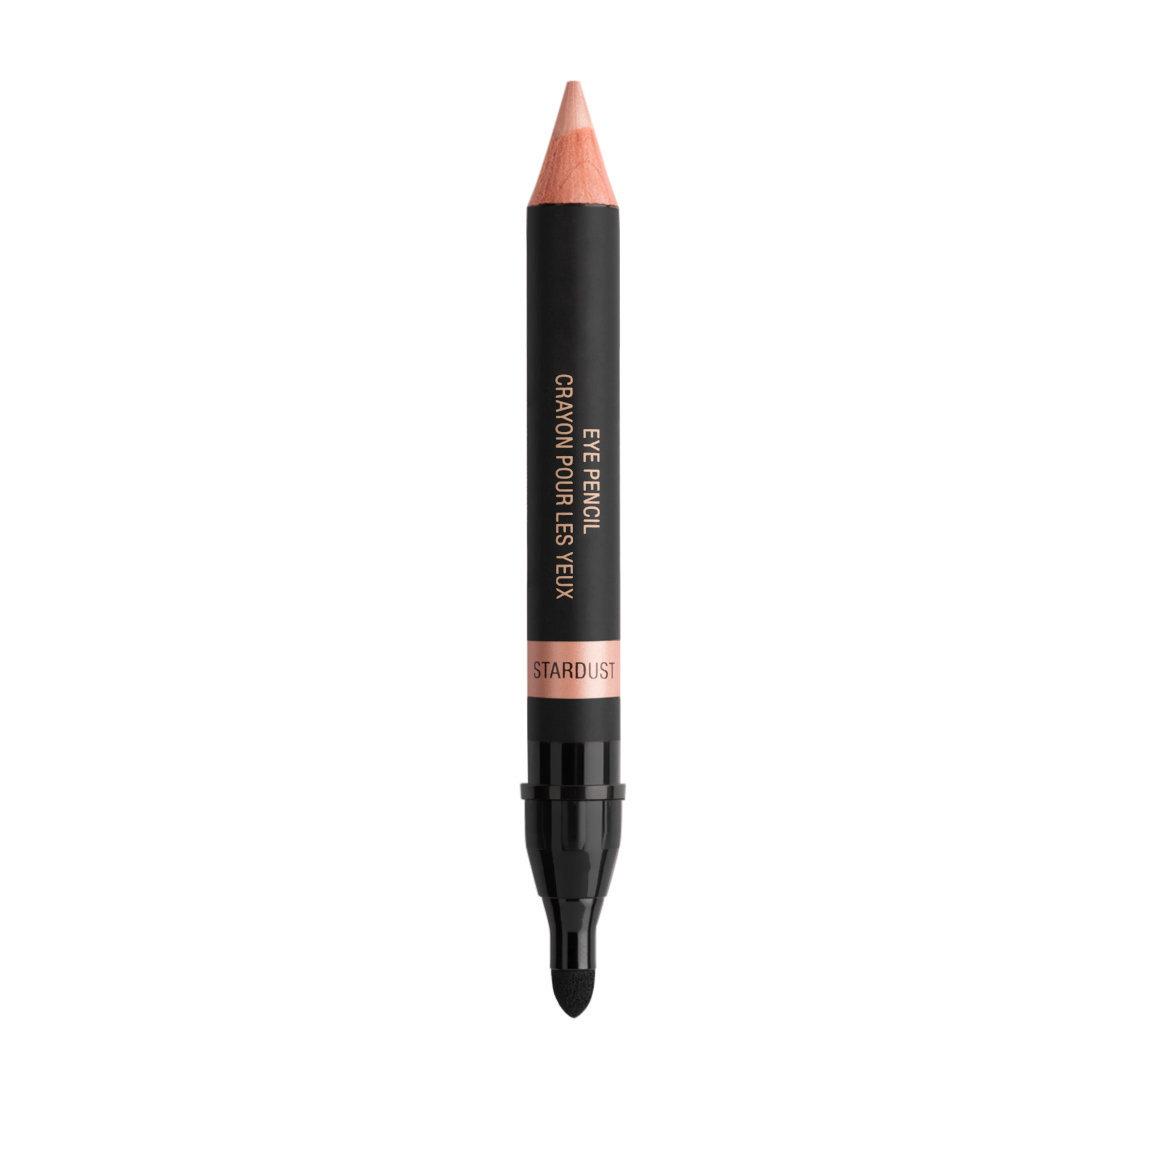 Nudestix Eye Pencil Stardust alternative view 1.